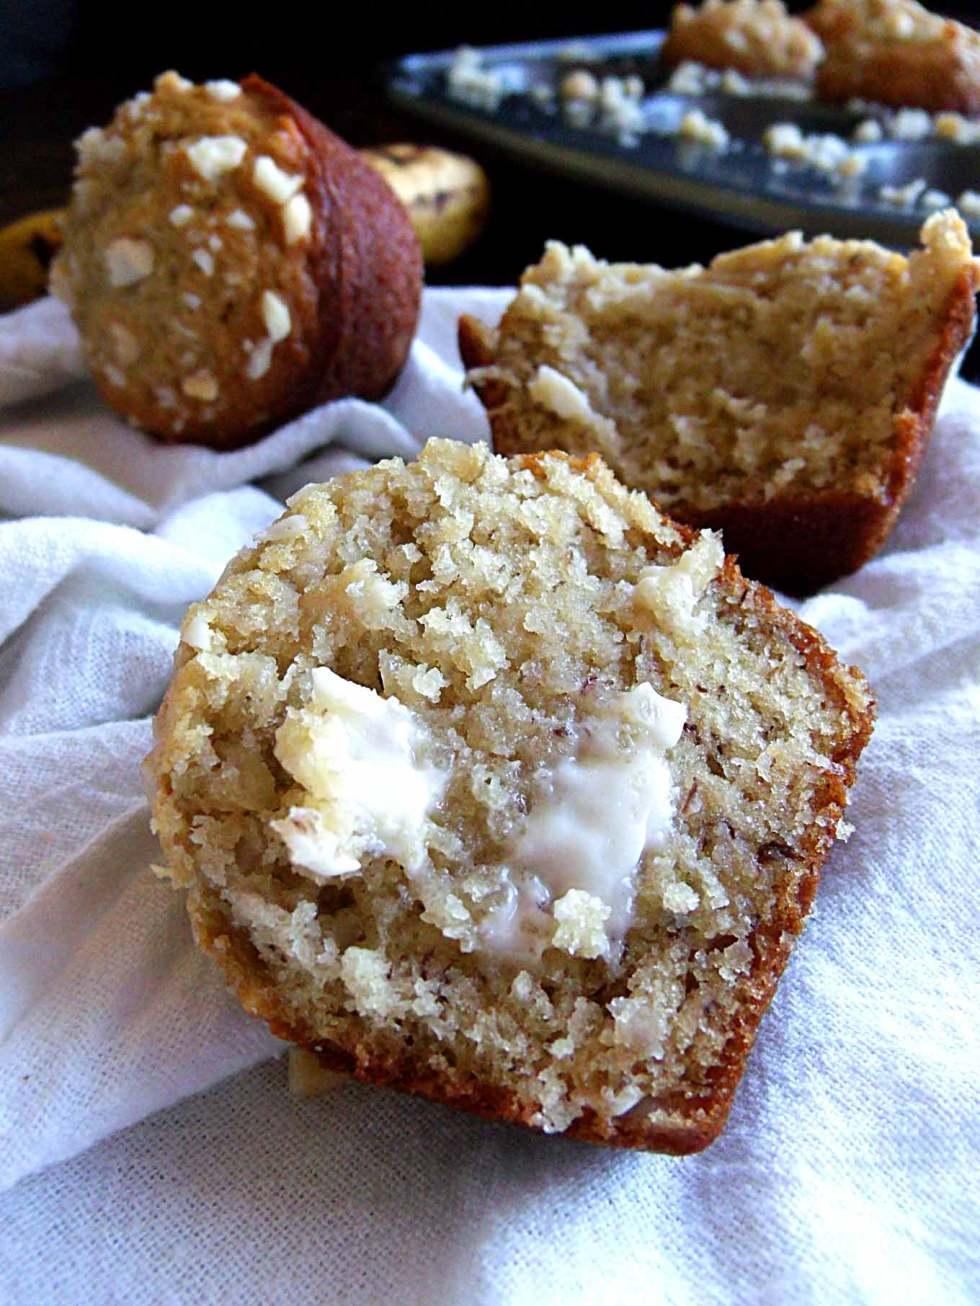 Banana Macadamia Nut Muffins - inspired by the muffins at Huggo's in Kona, Hawaii!